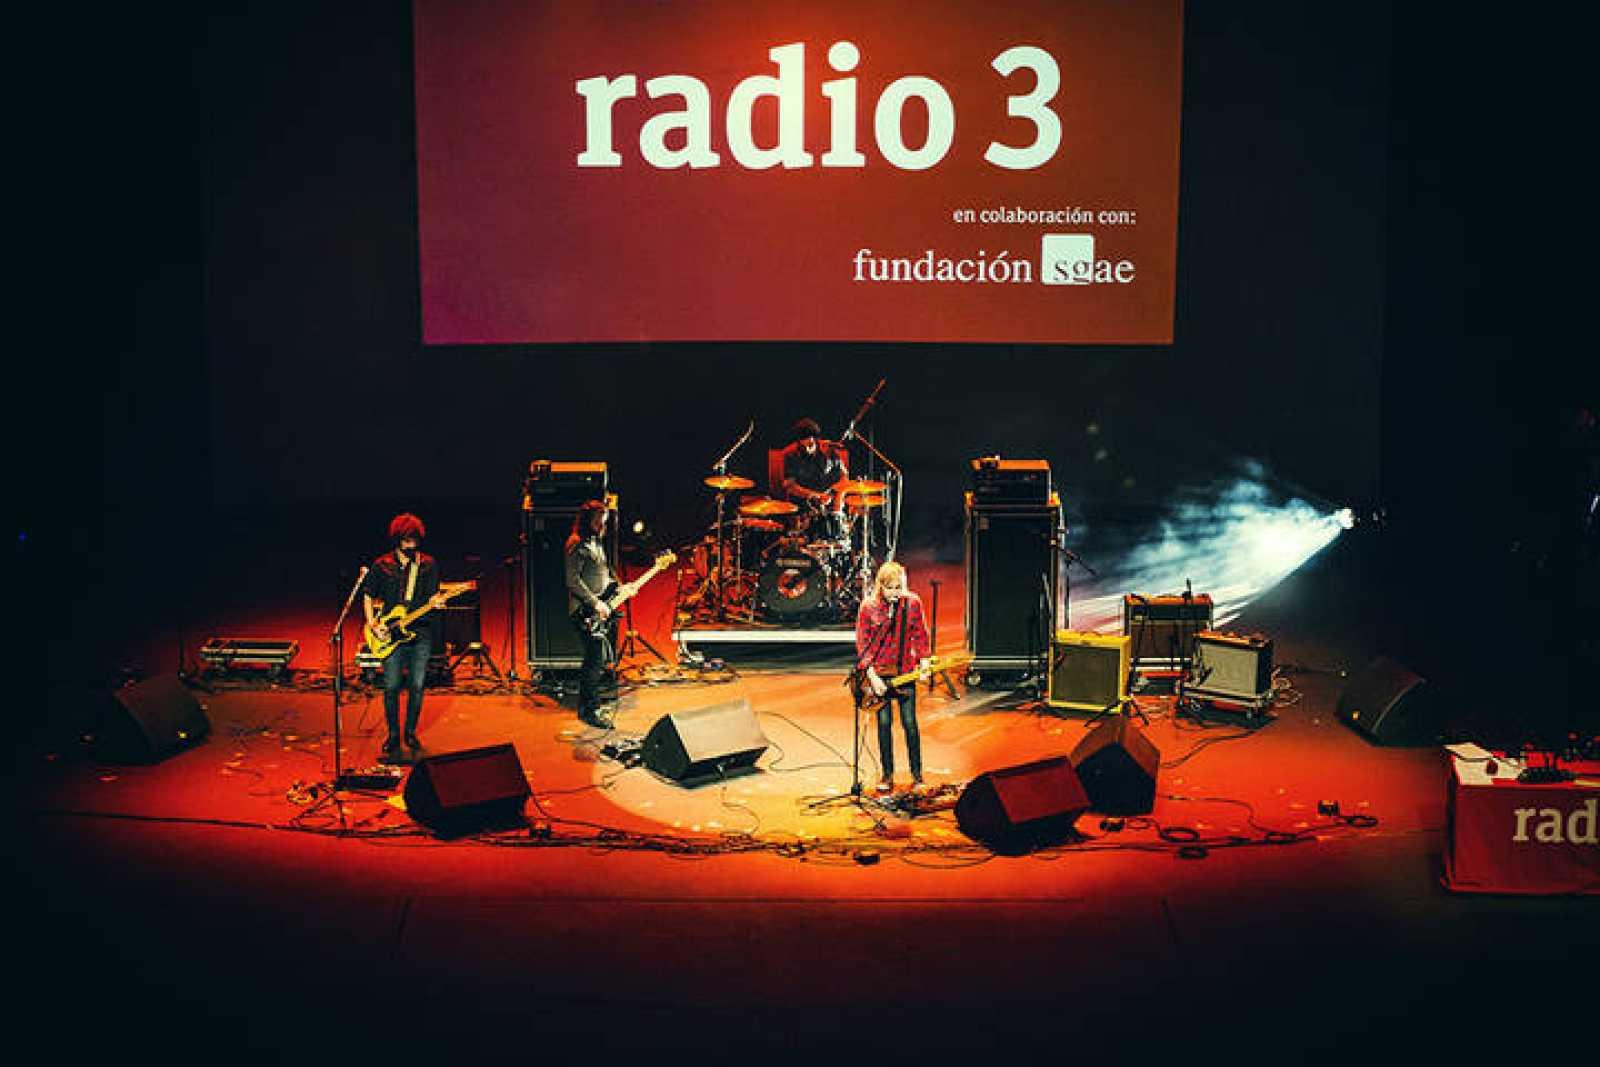 Fiesta de Radio 3 en Murcia